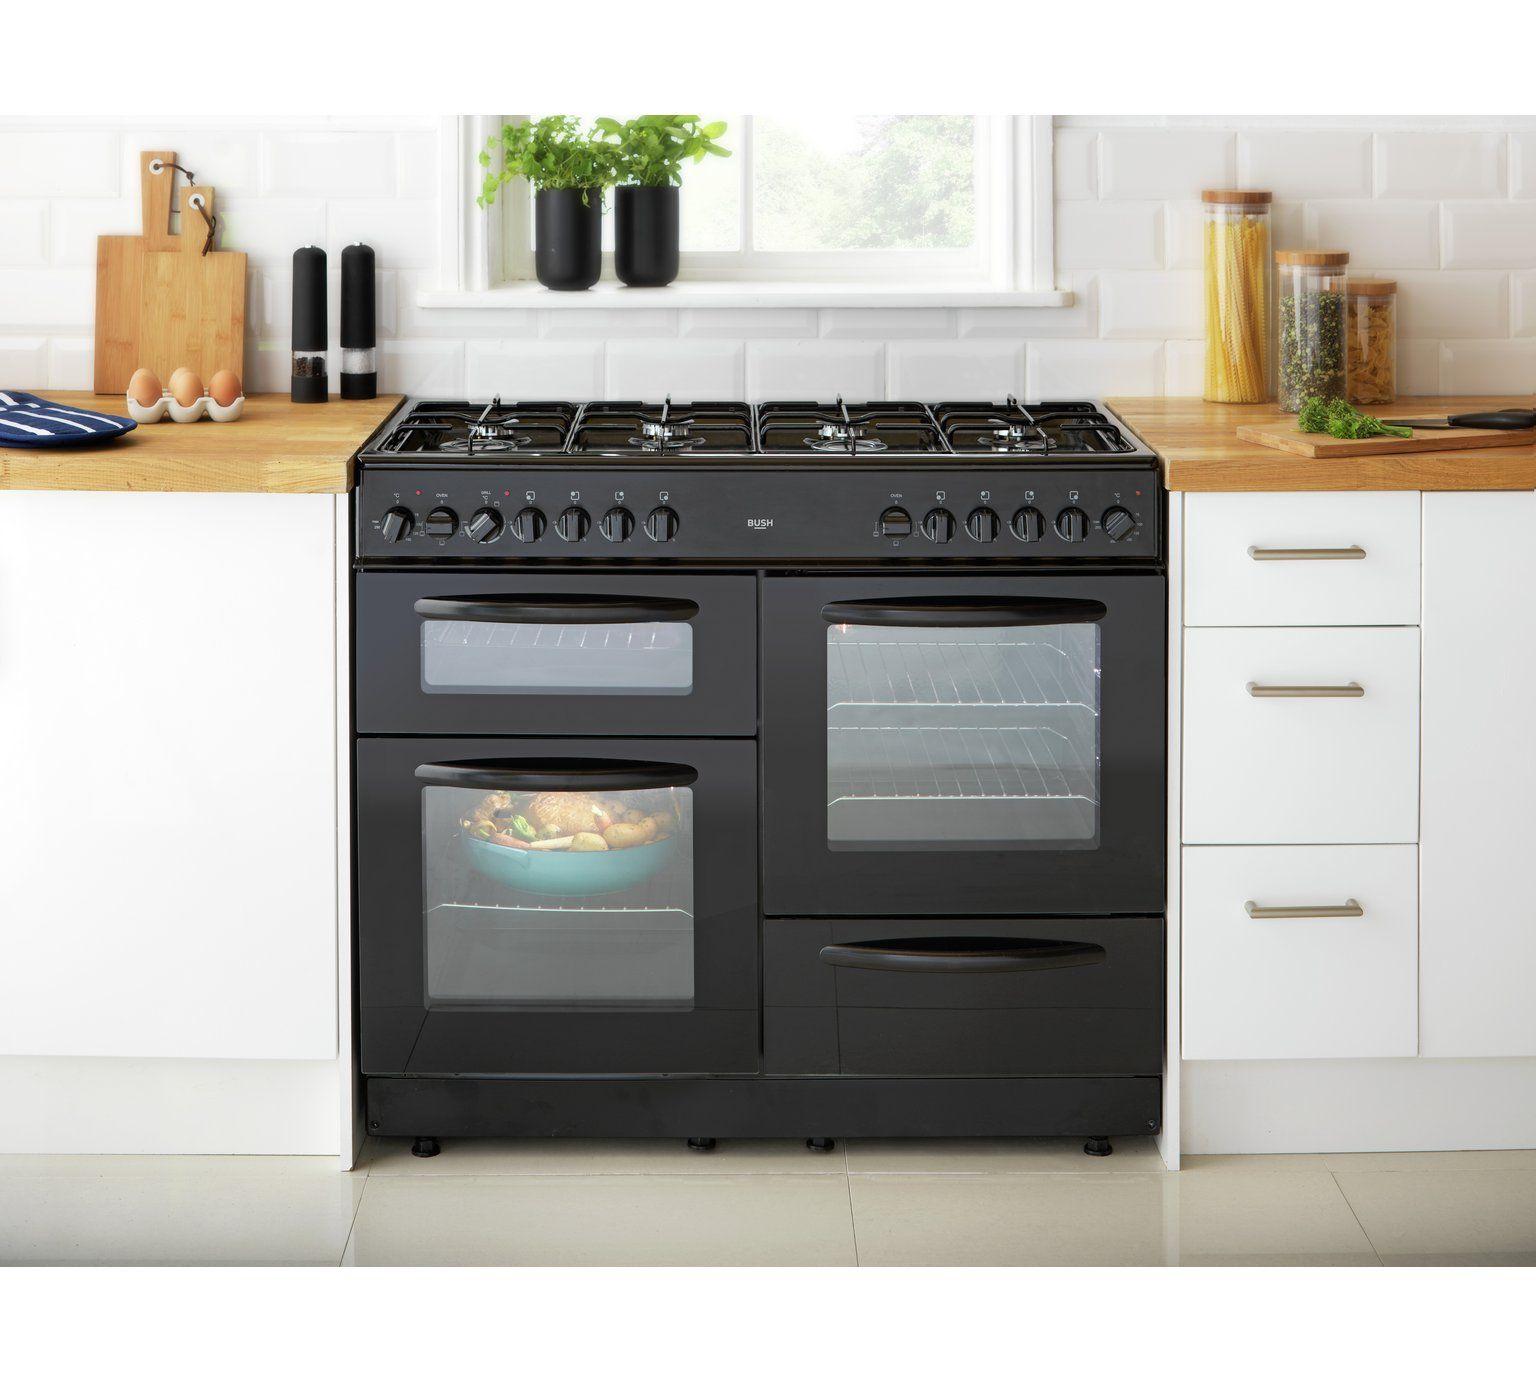 Buy Bush BC100DFB Dual Fuel Range Cooker - Black at Argos.co.uk ...